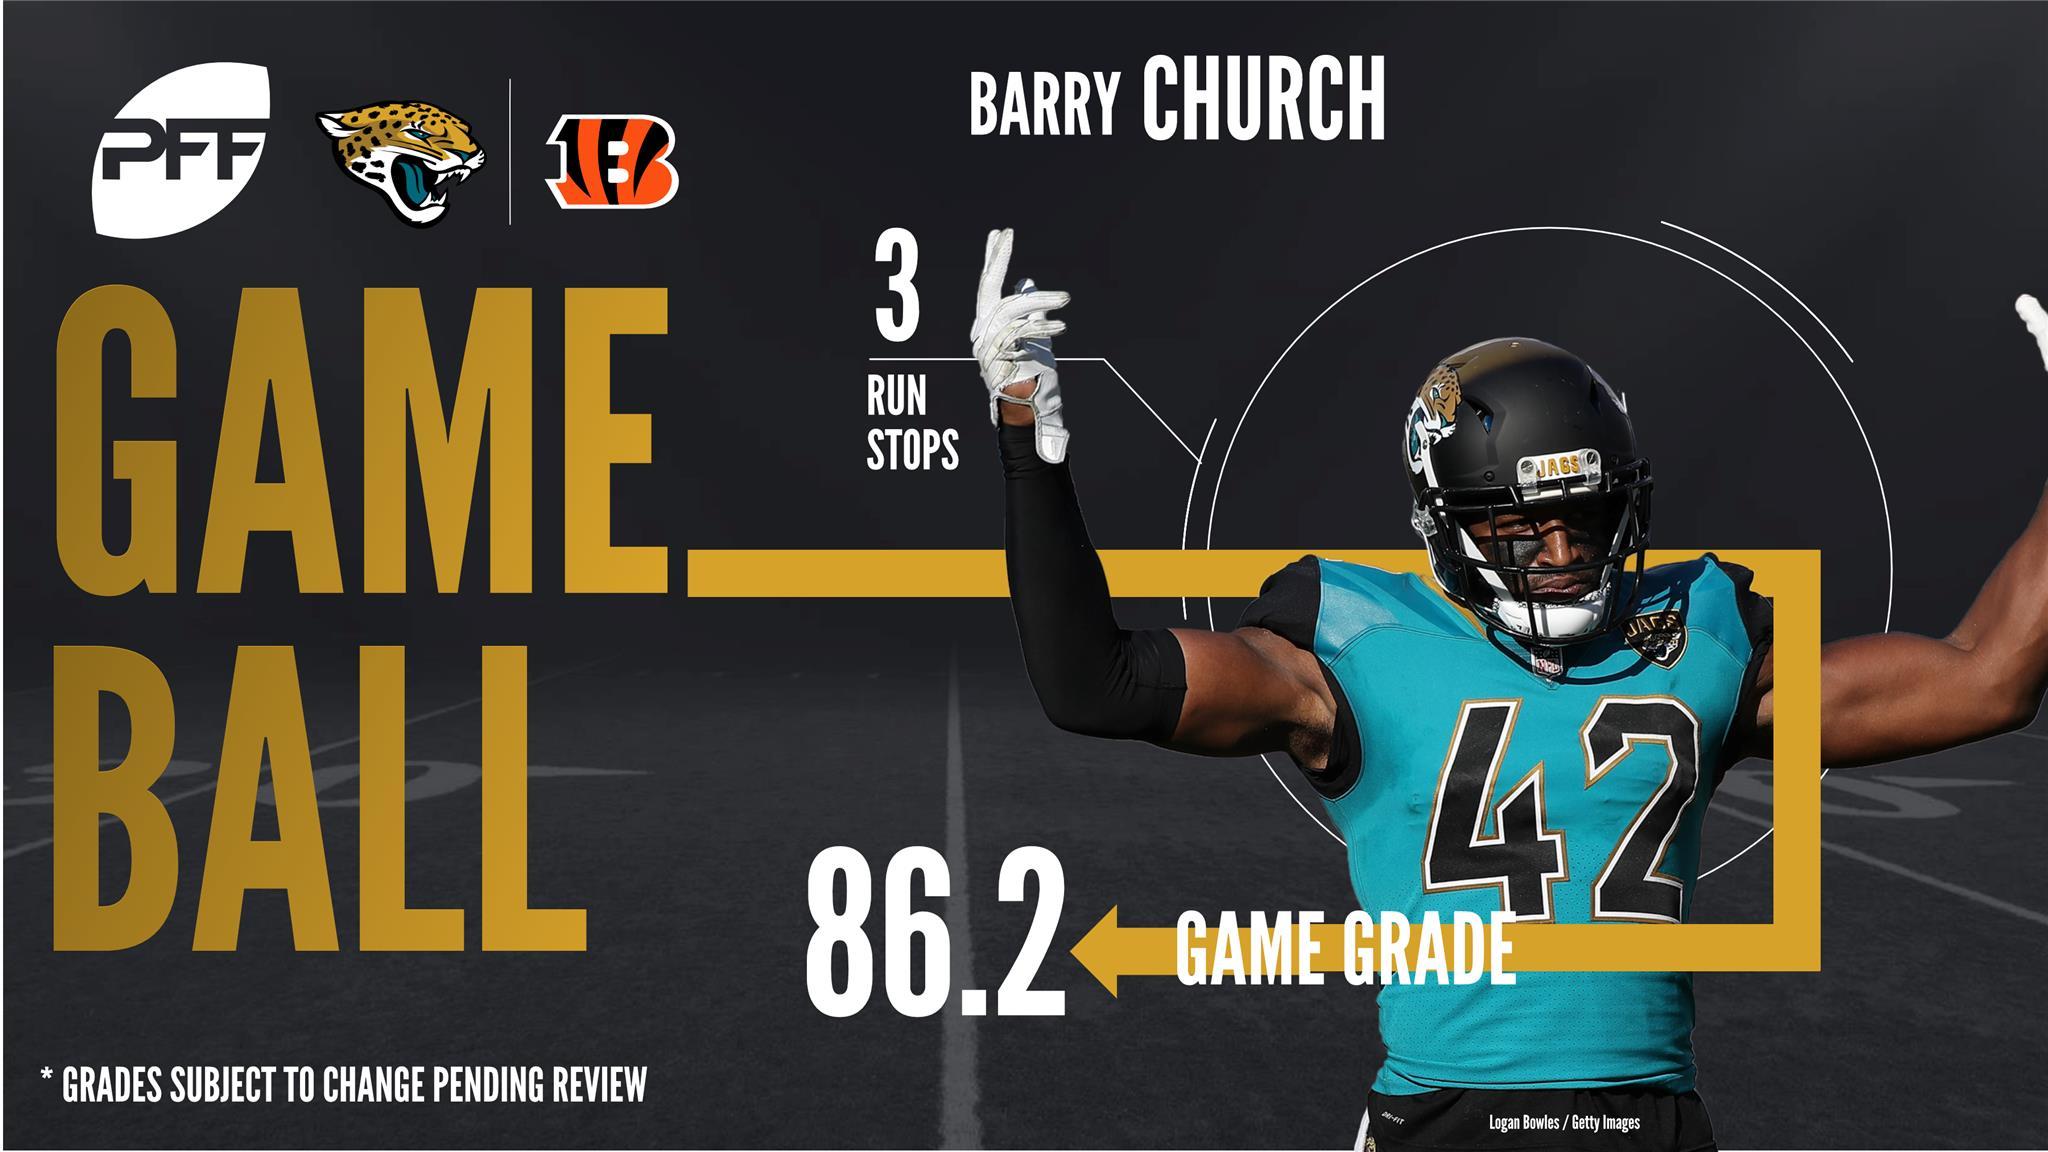 Barry Church, safety, Jacksonville Jaguars